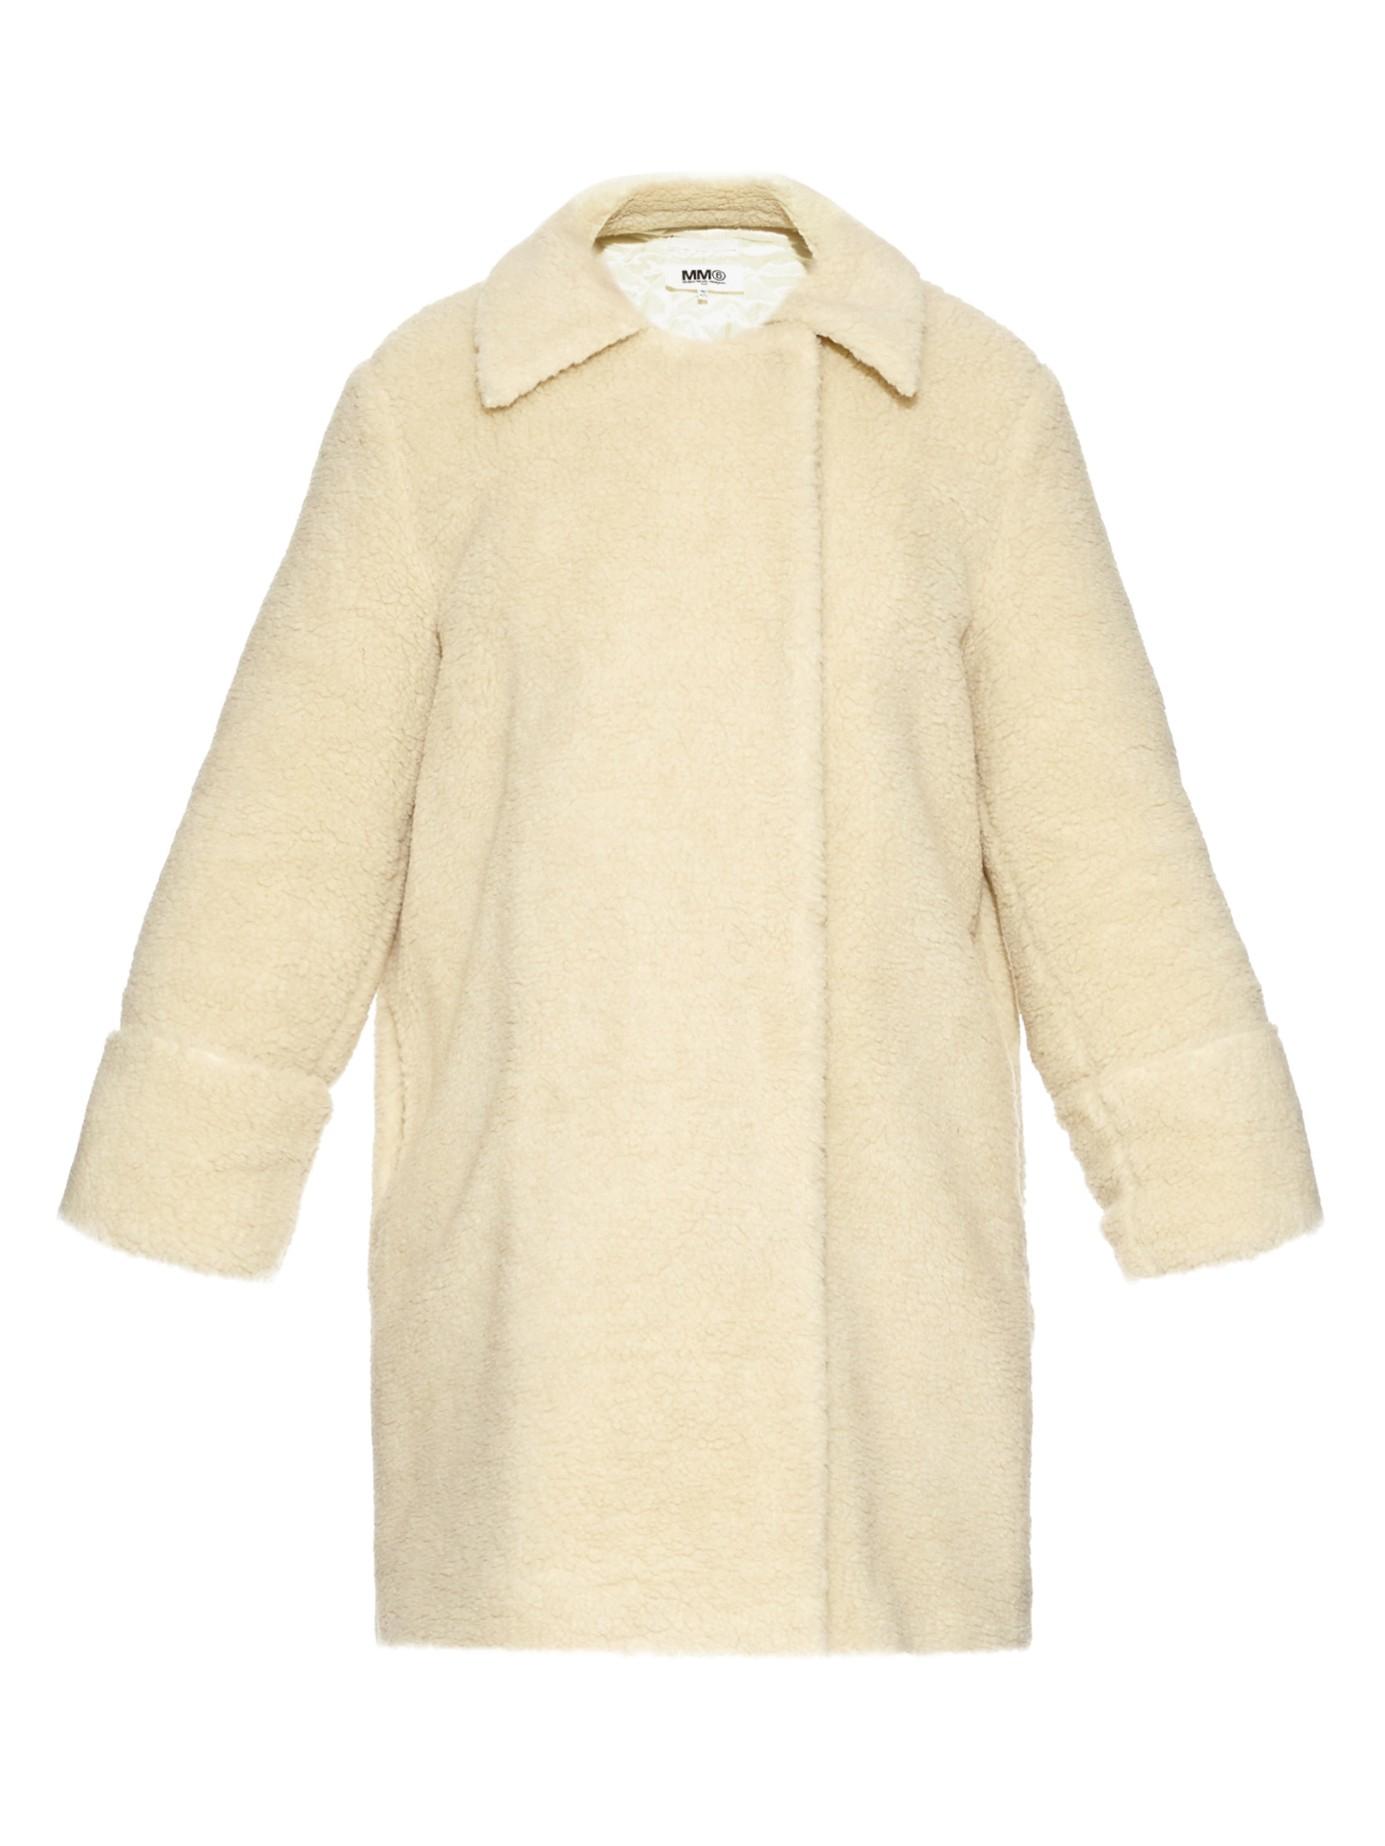 Lyst - MM6 by Maison Martin Margiela Teddy Faux-shearling Coat in White 2fc378801b1fa